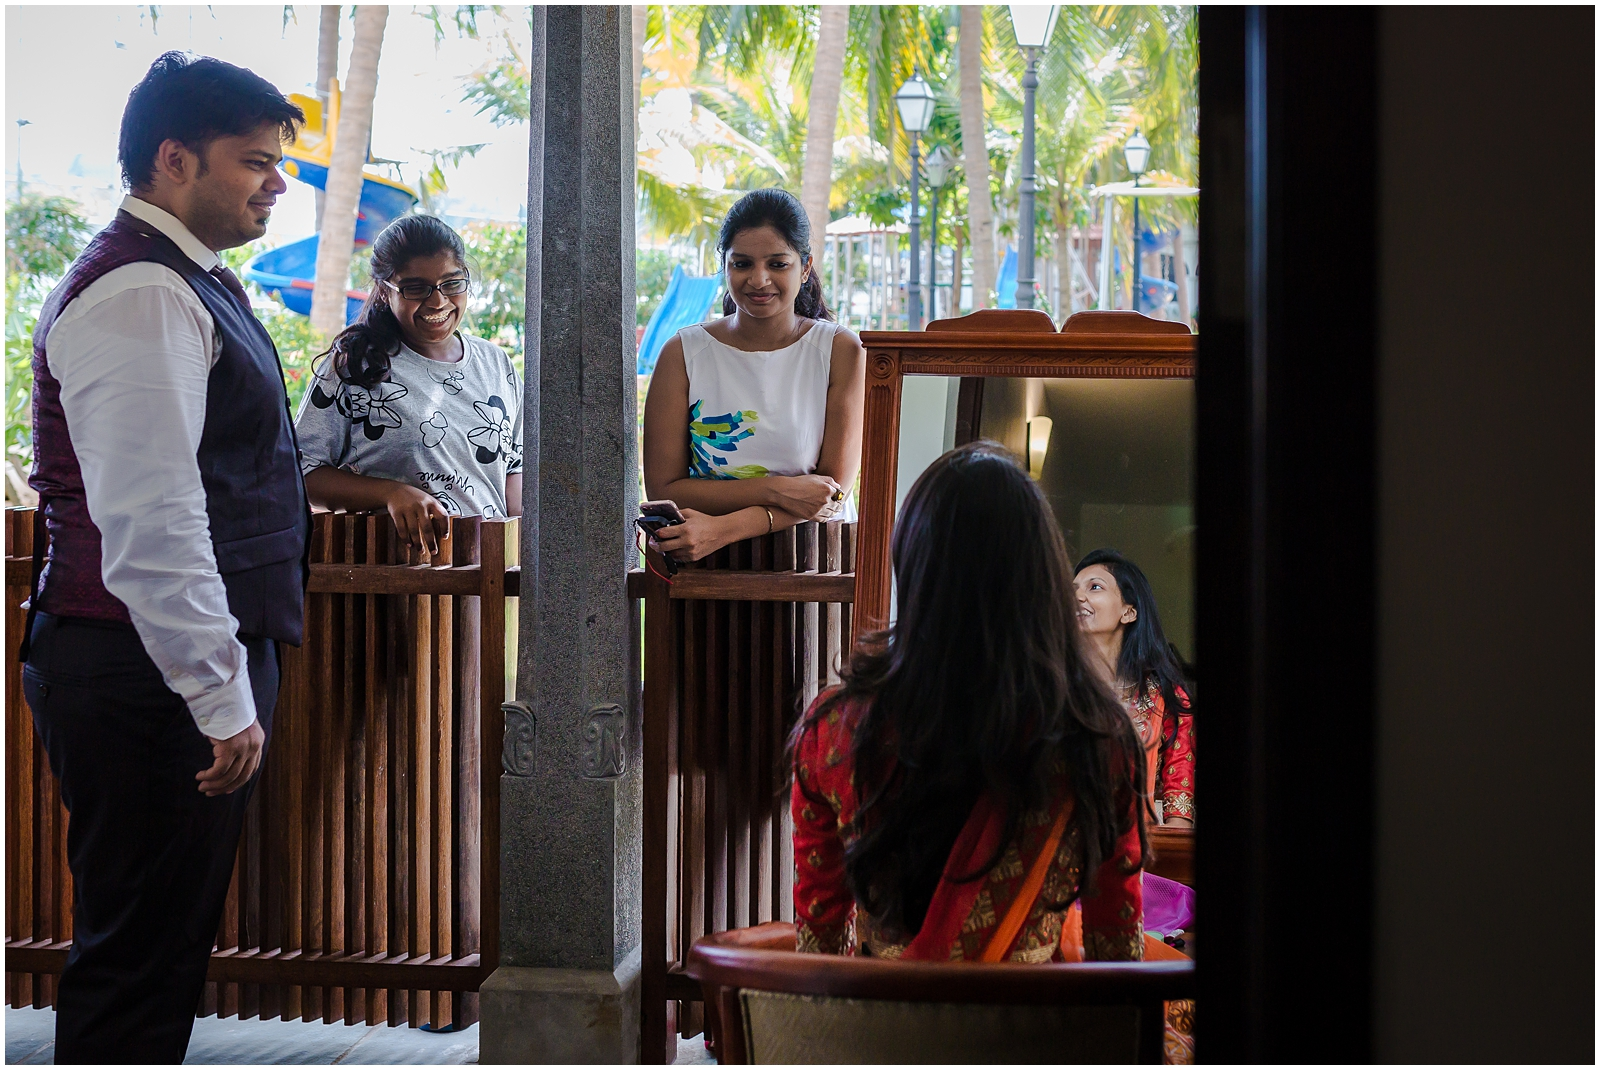 03072017-Anusha-Nithin-Beach-Destination-Wedding-026.jpg